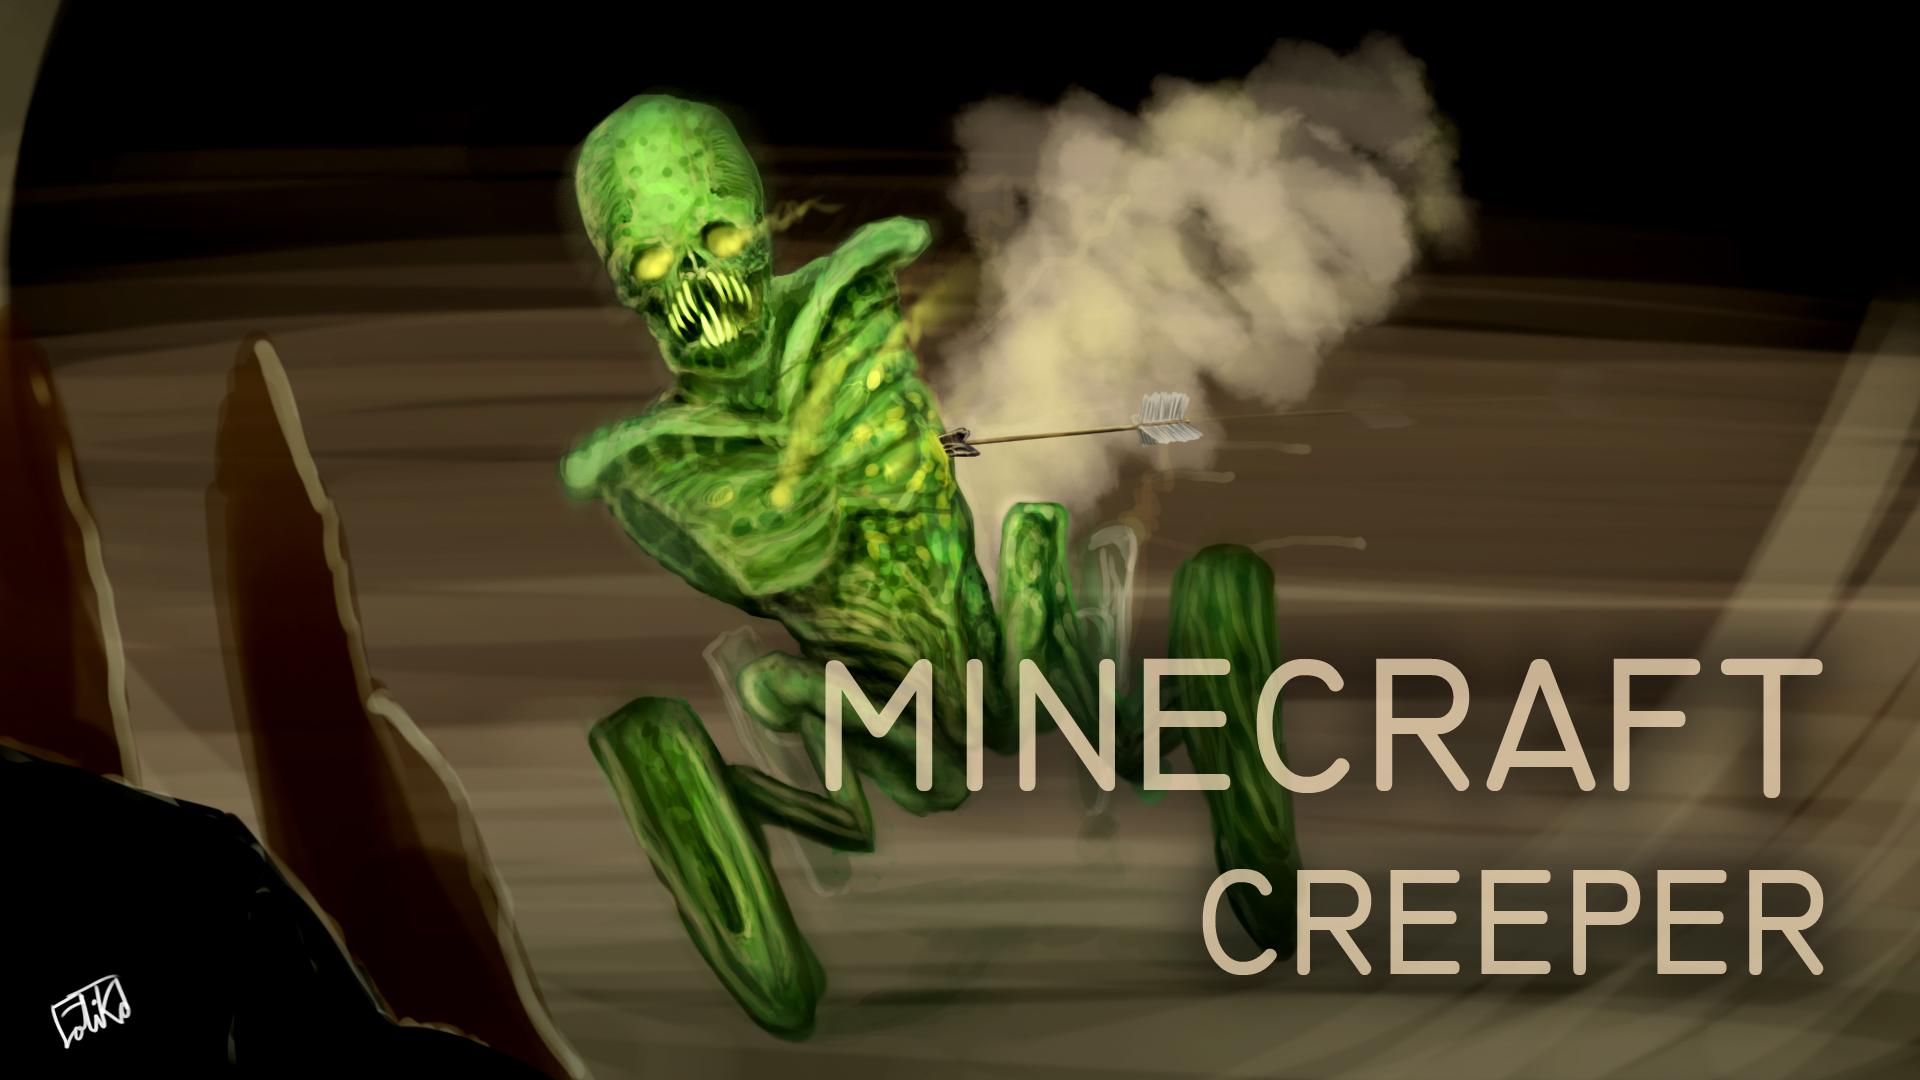 Amazing Wallpaper Minecraft Real Life - minecraft___creeper_art_1920x1080p_by_polikosaurio-d6a0lzj  Graphic_95584.jpg